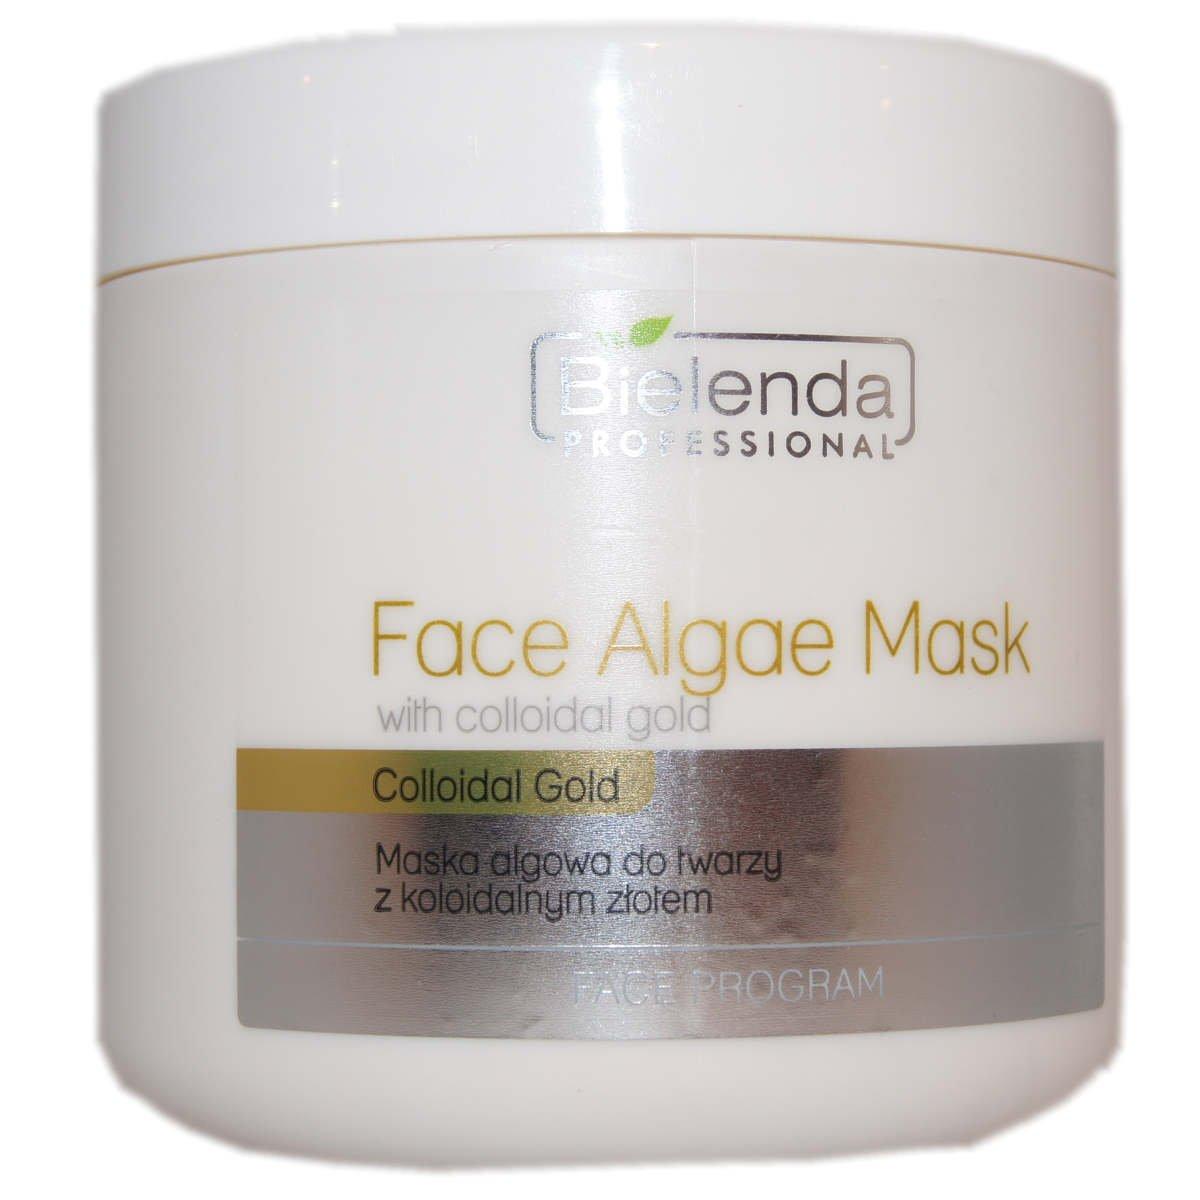 Bielenda professional - Bielenda Professional Anti Age Face Algae Mask With Colloidal Gold 190g Amazon Co Uk Beauty